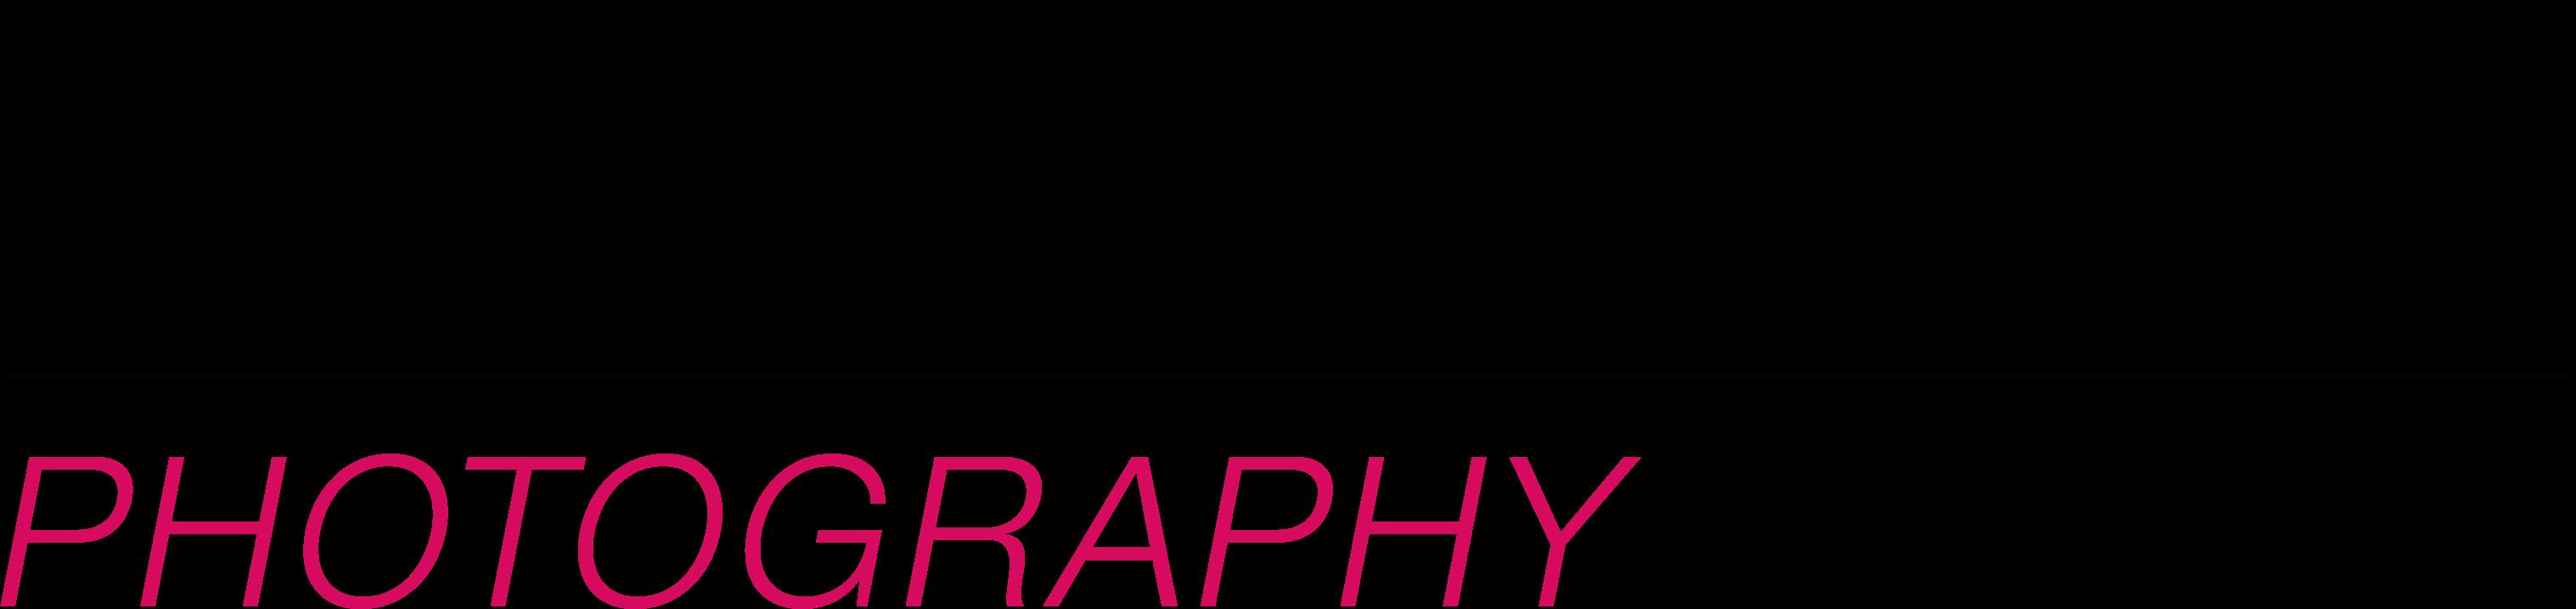 Blitzsaloon Photography Berlin Logo